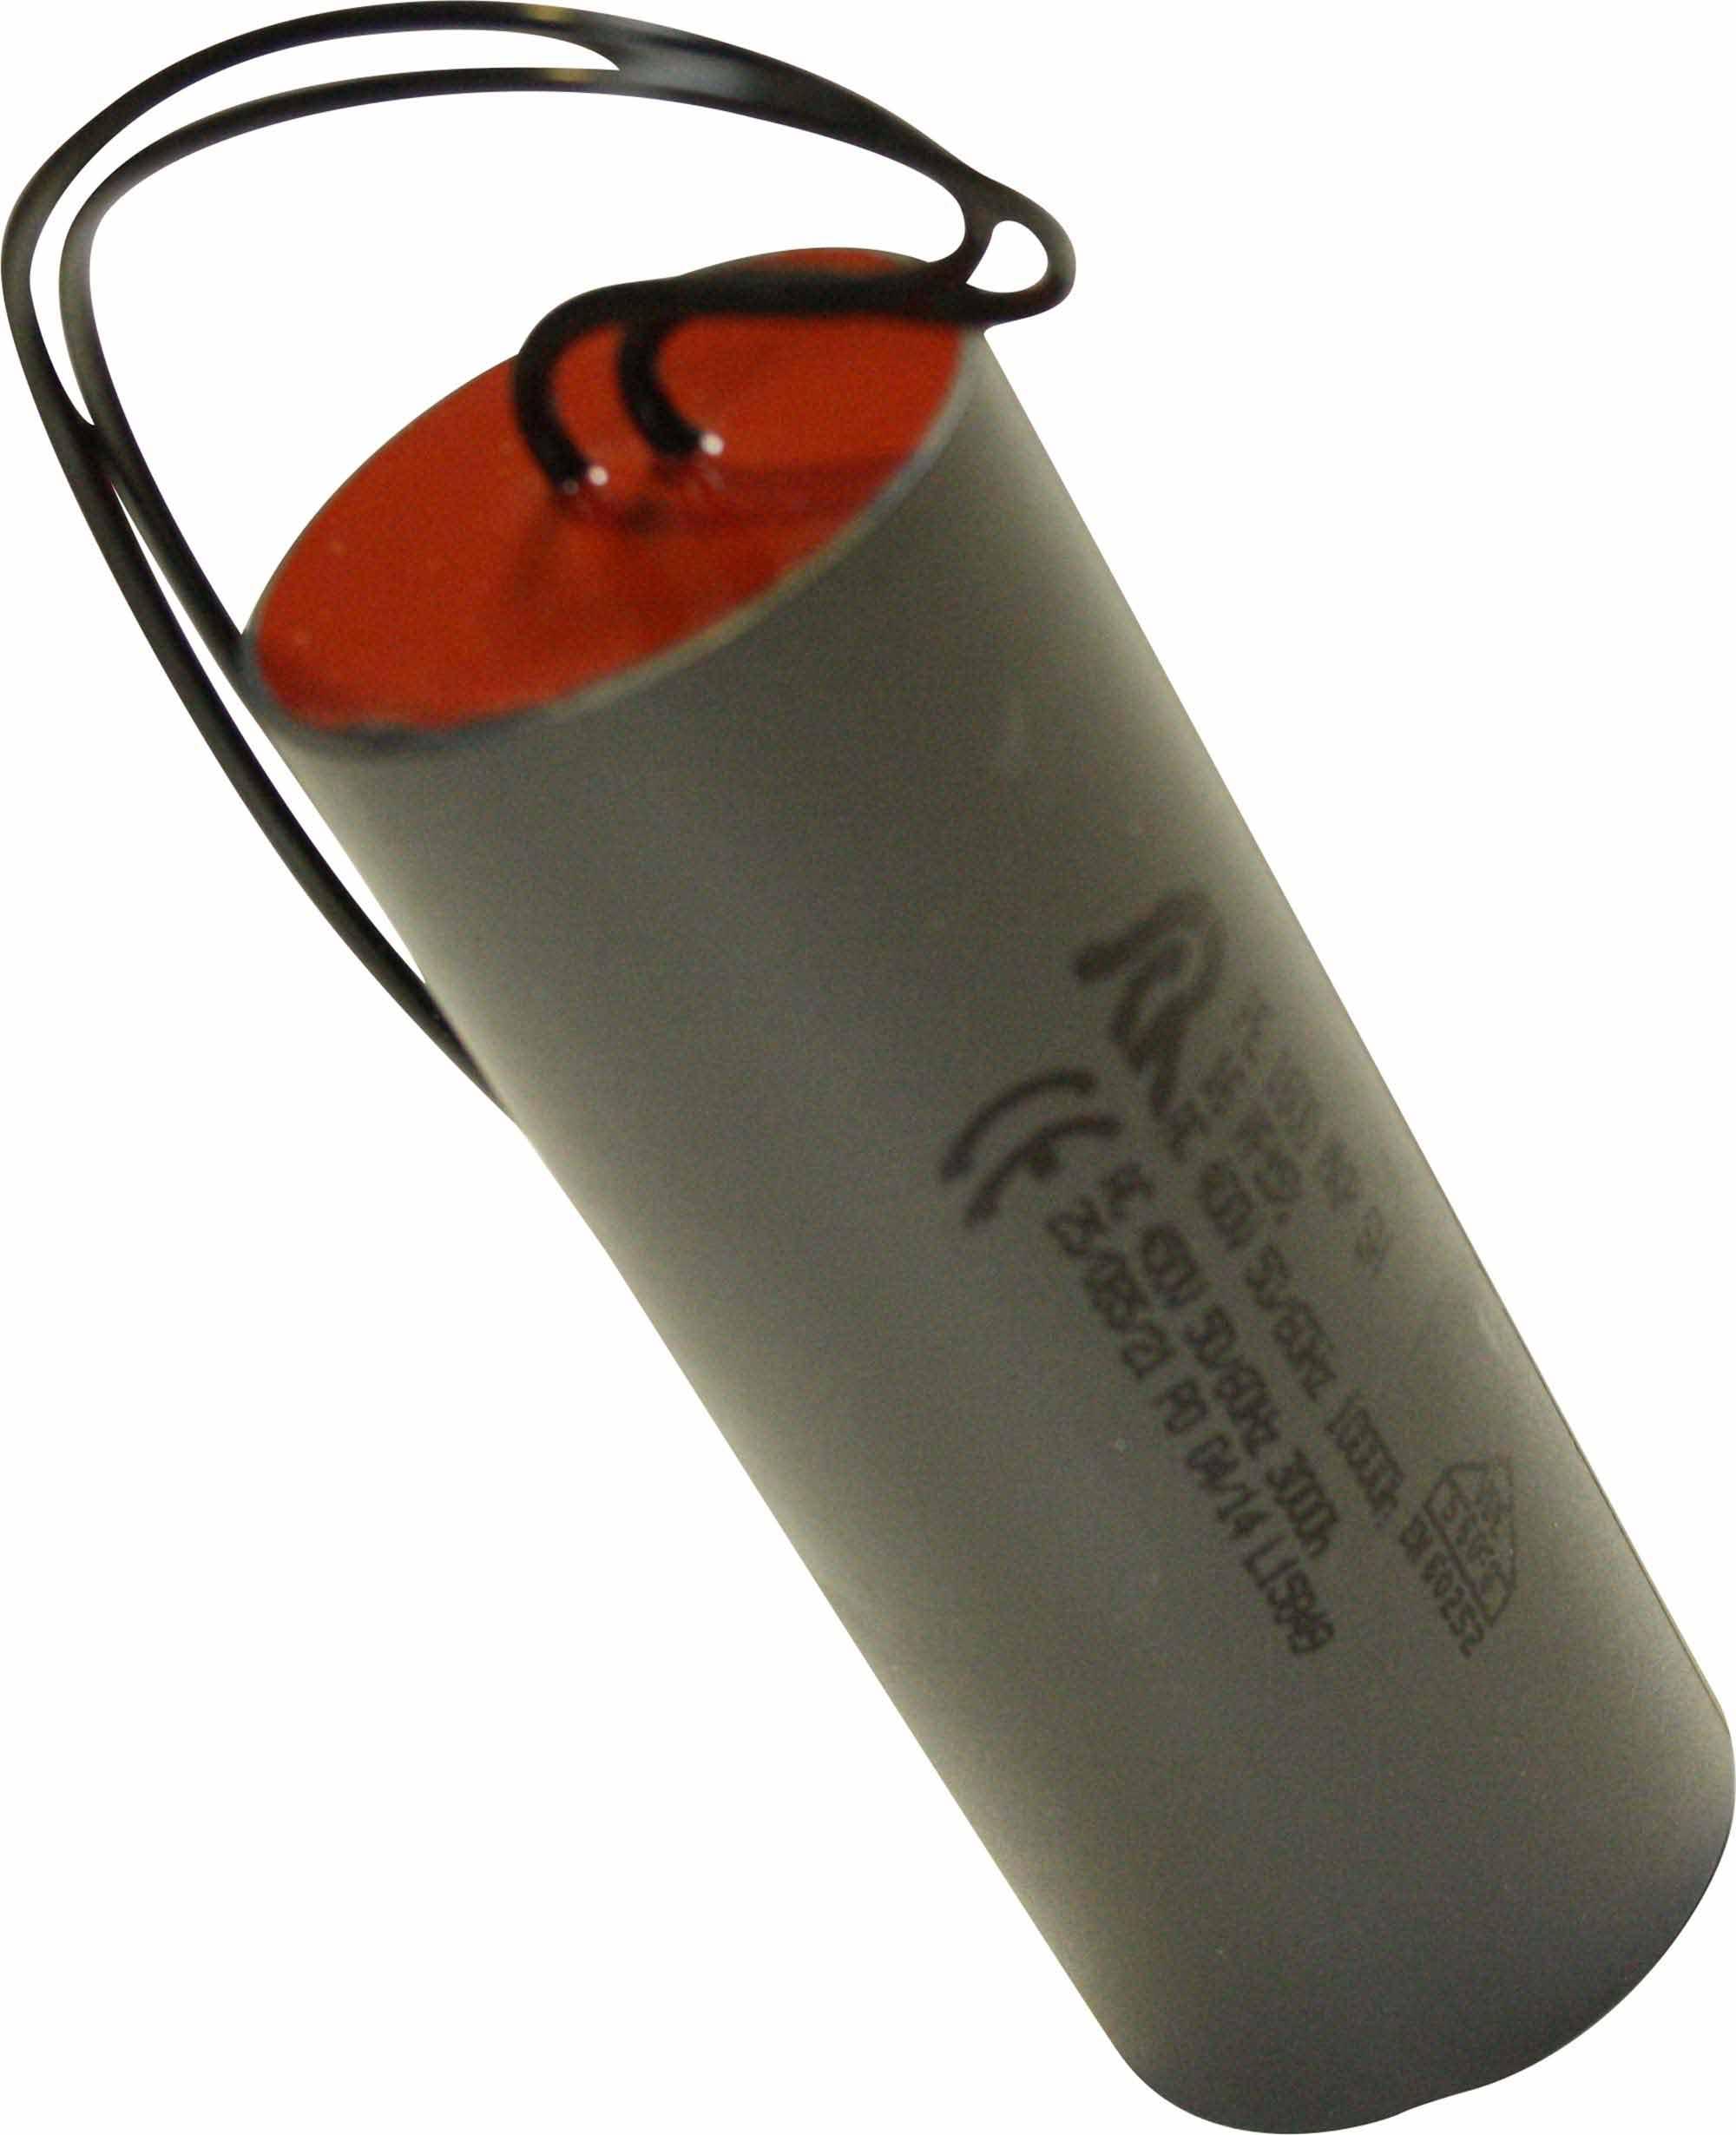 Condensateur 16 µF Pompe Piscine (88x35)